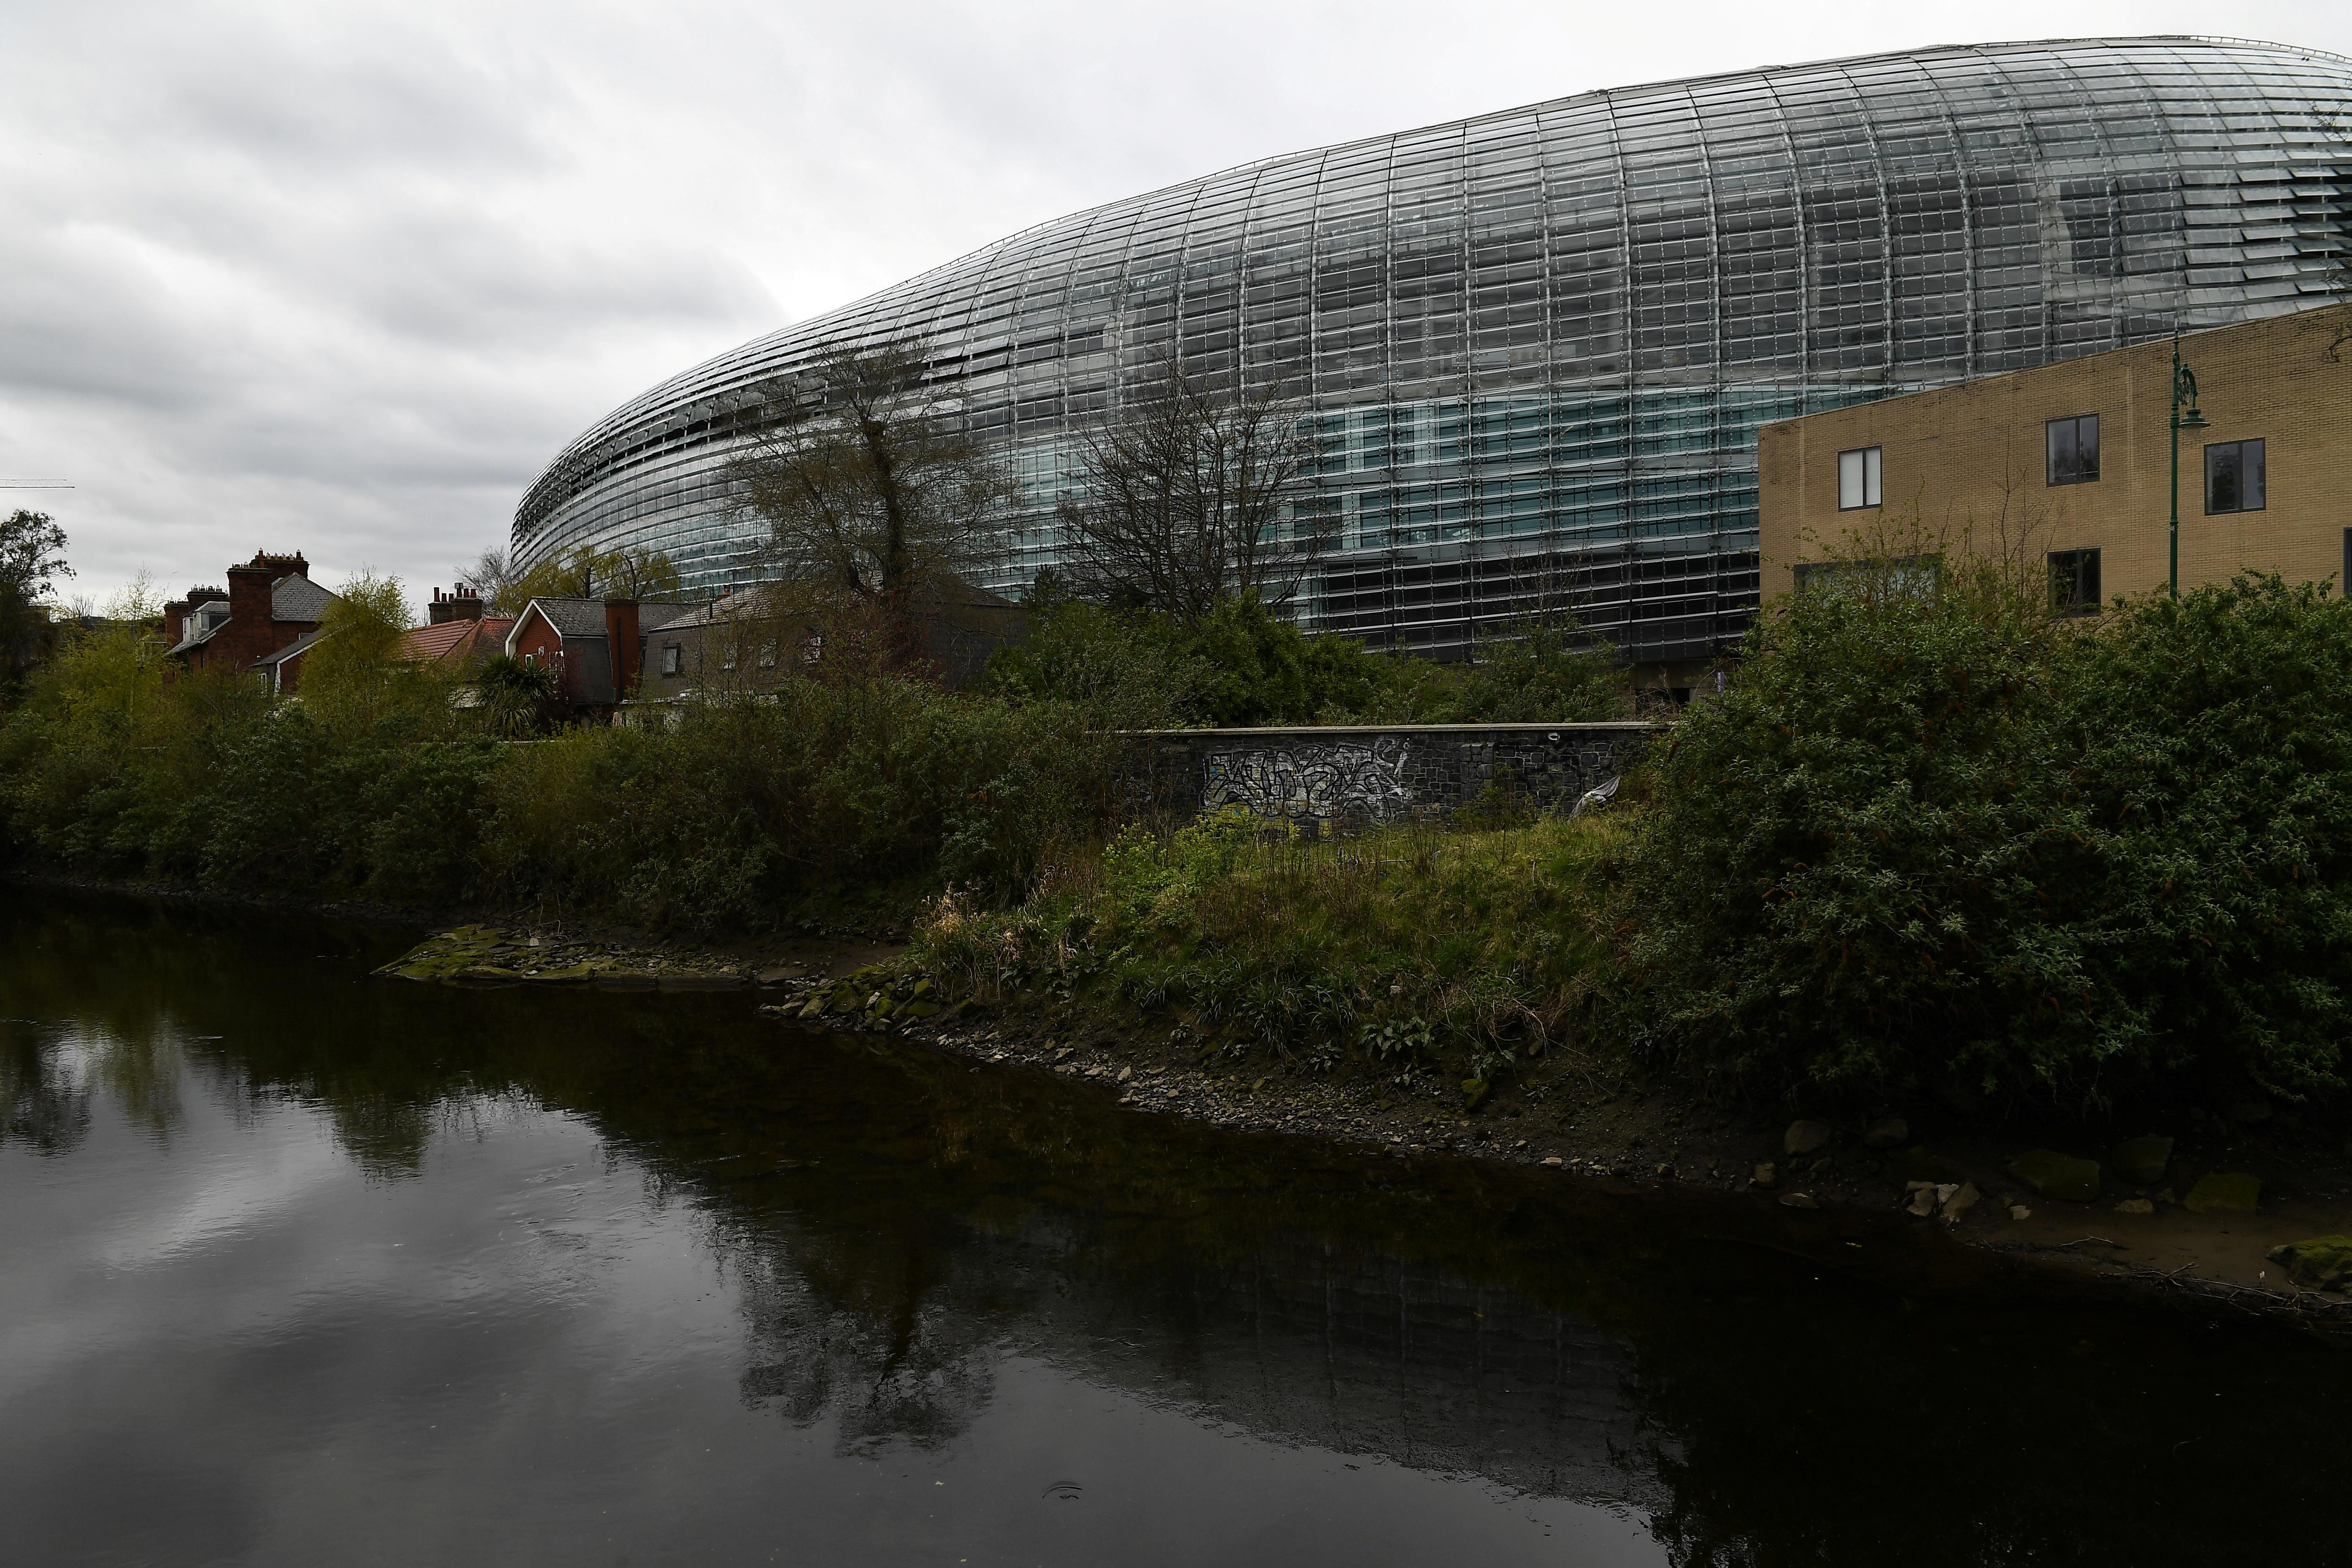 У Ирландии забирают матчи Евро-2020 и отдают России: все решено на 99%